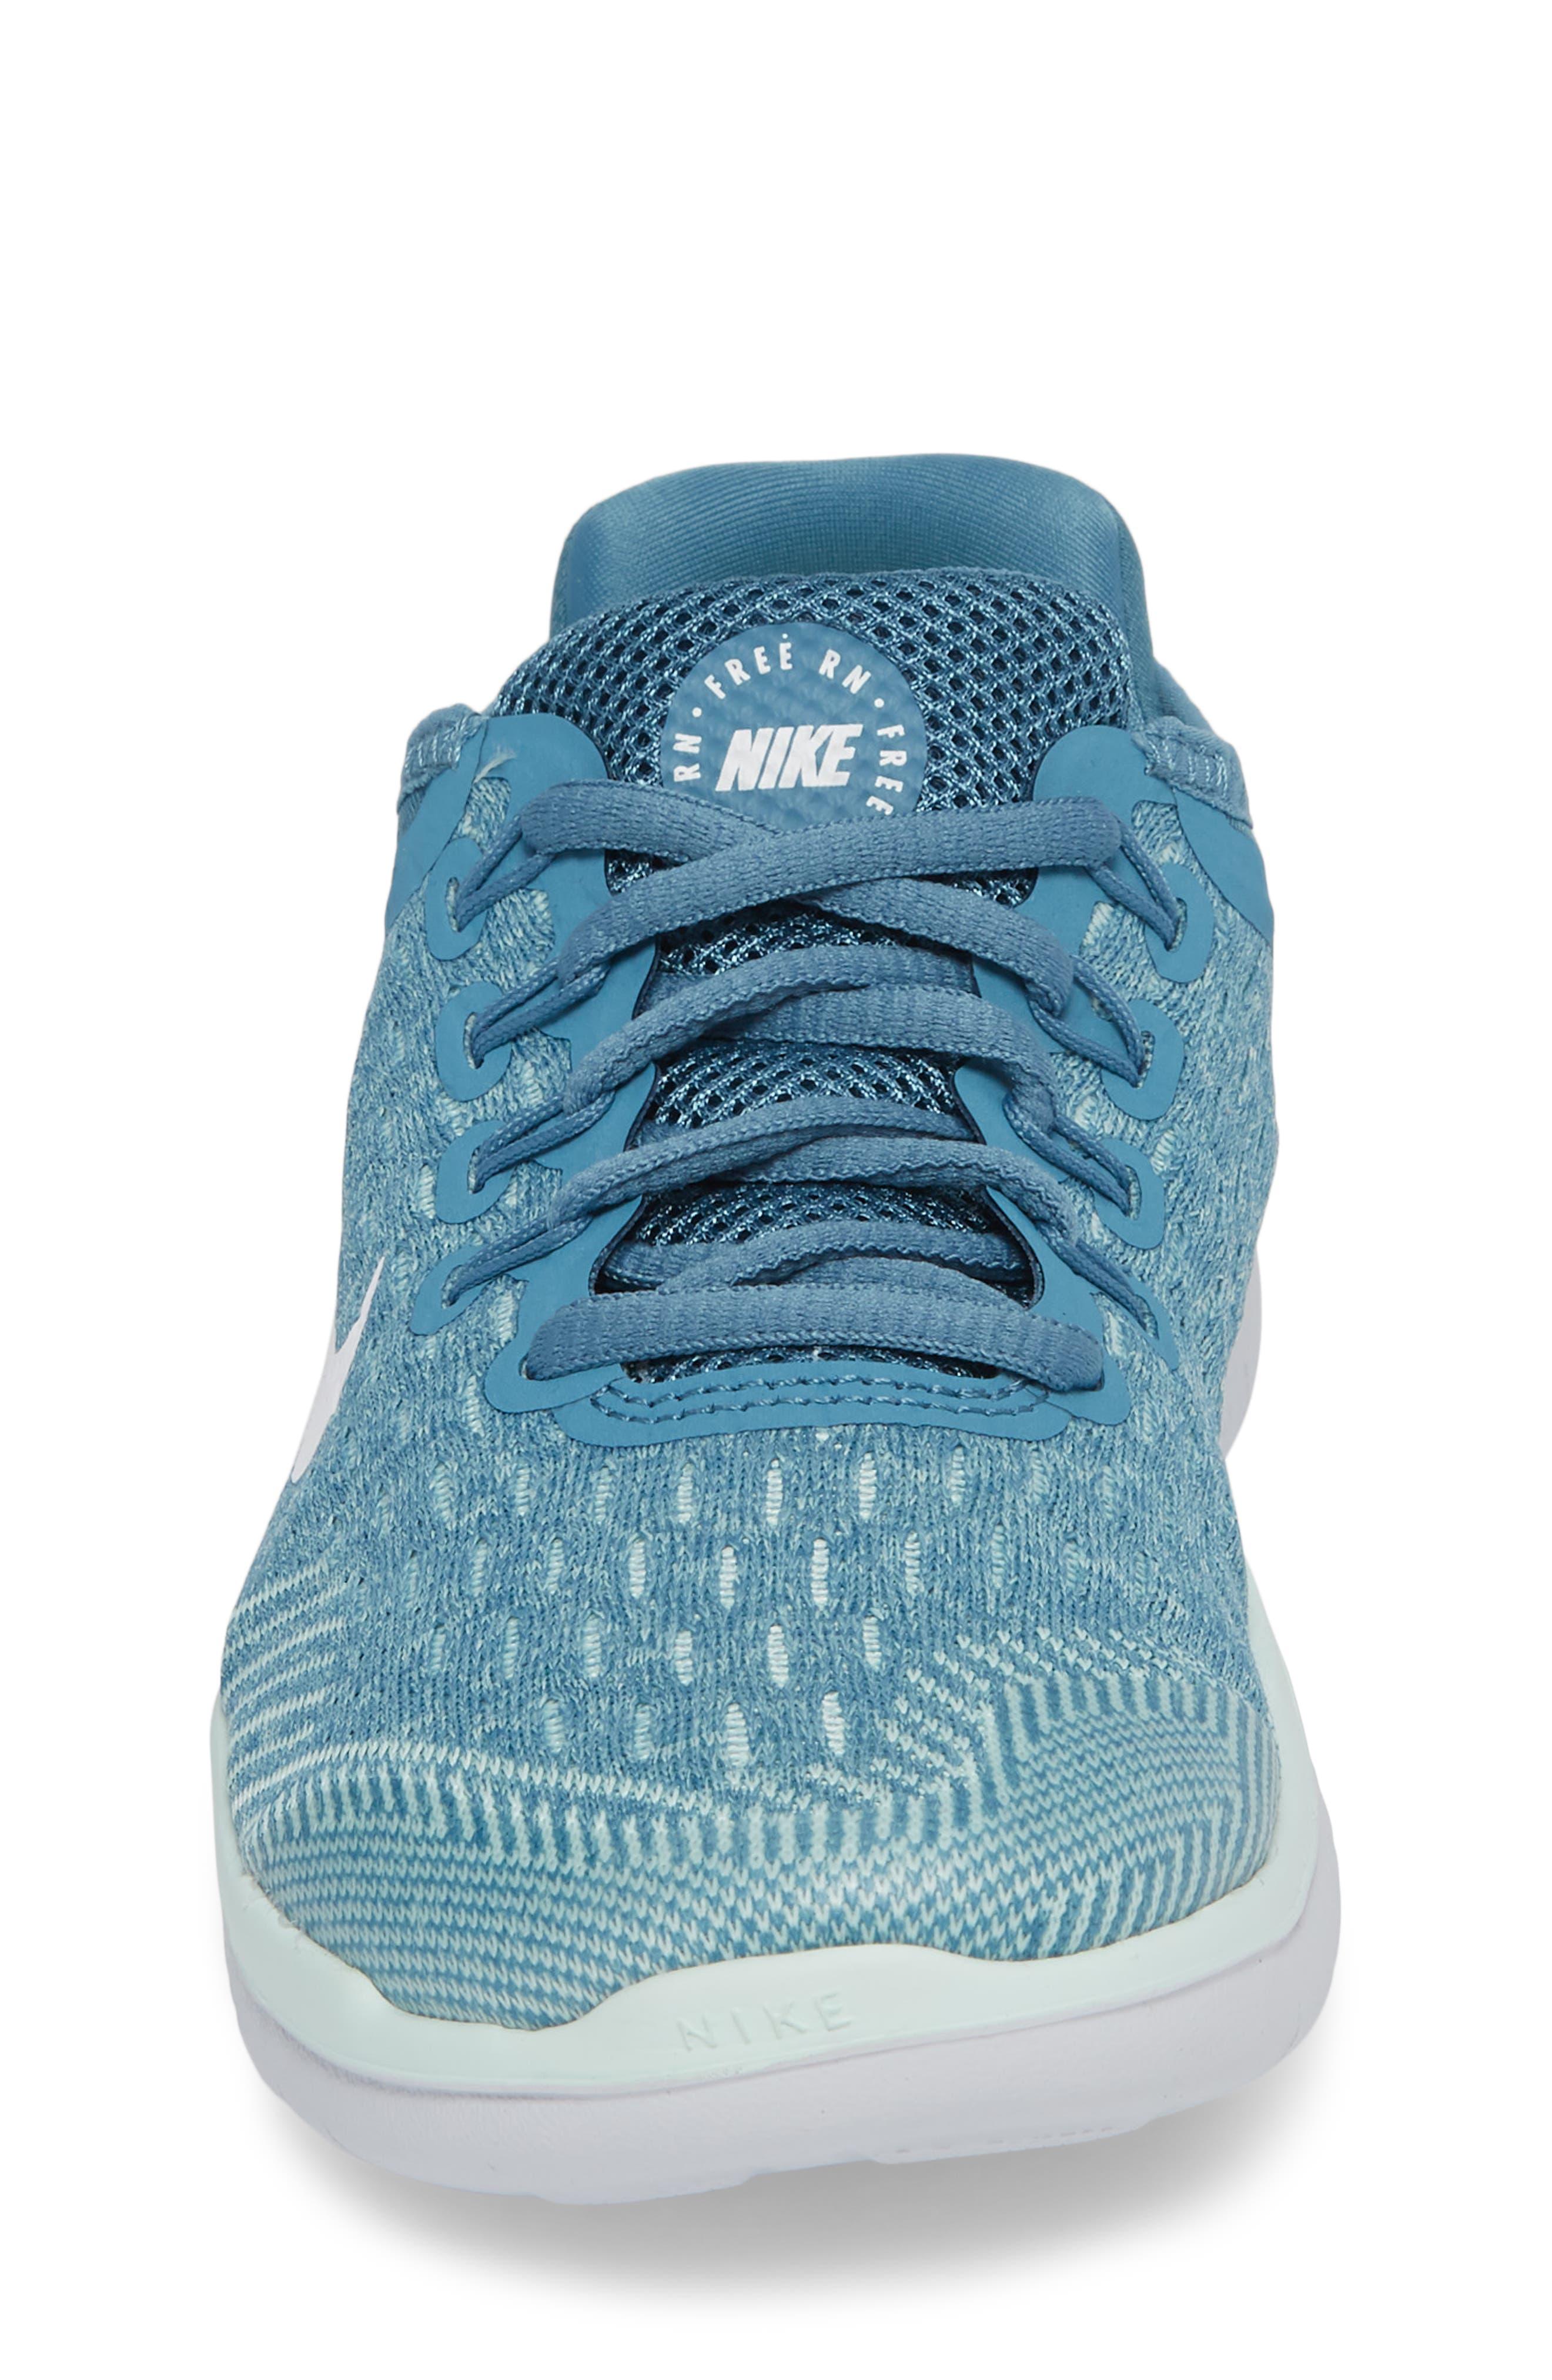 Free RN 2018 Running Shoe,                             Alternate thumbnail 4, color,                             AQUA/ WHITE/ PURE PLATINUM